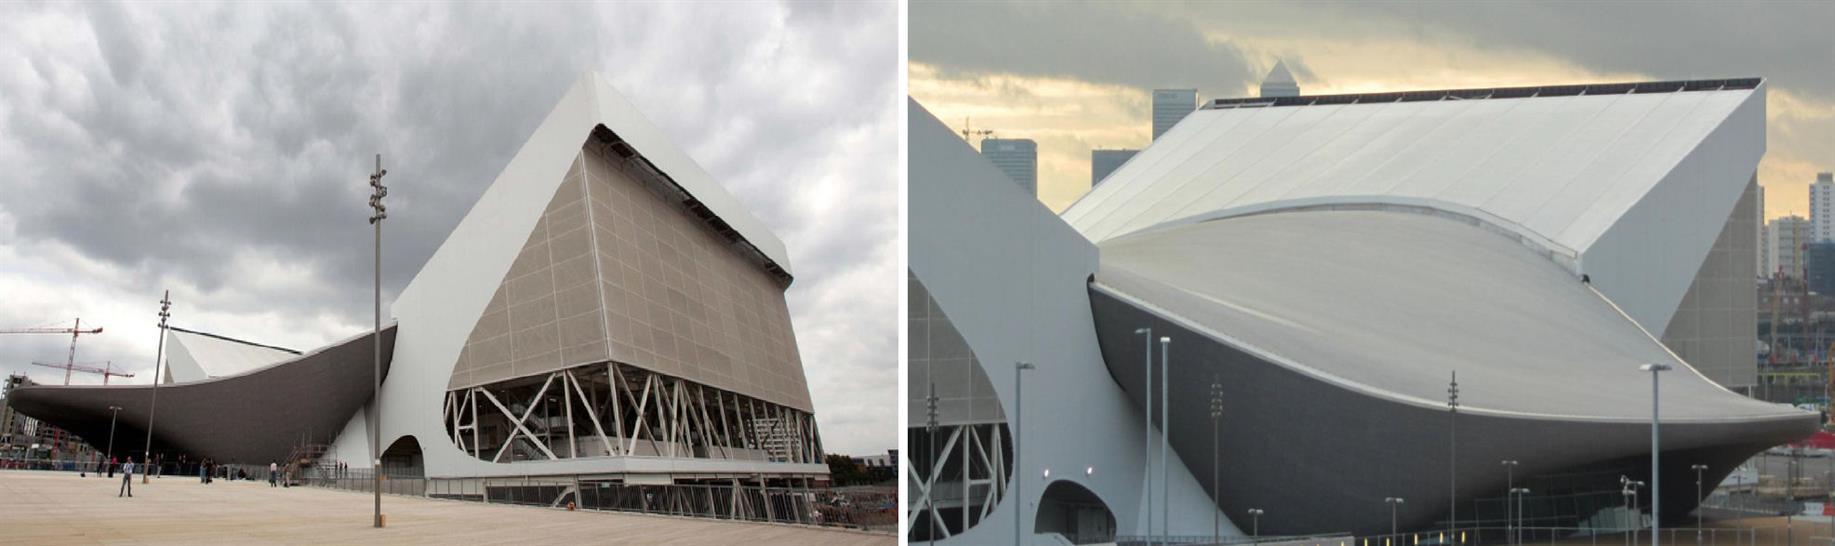 Aquatics Centre. Images: Serge Ferrari